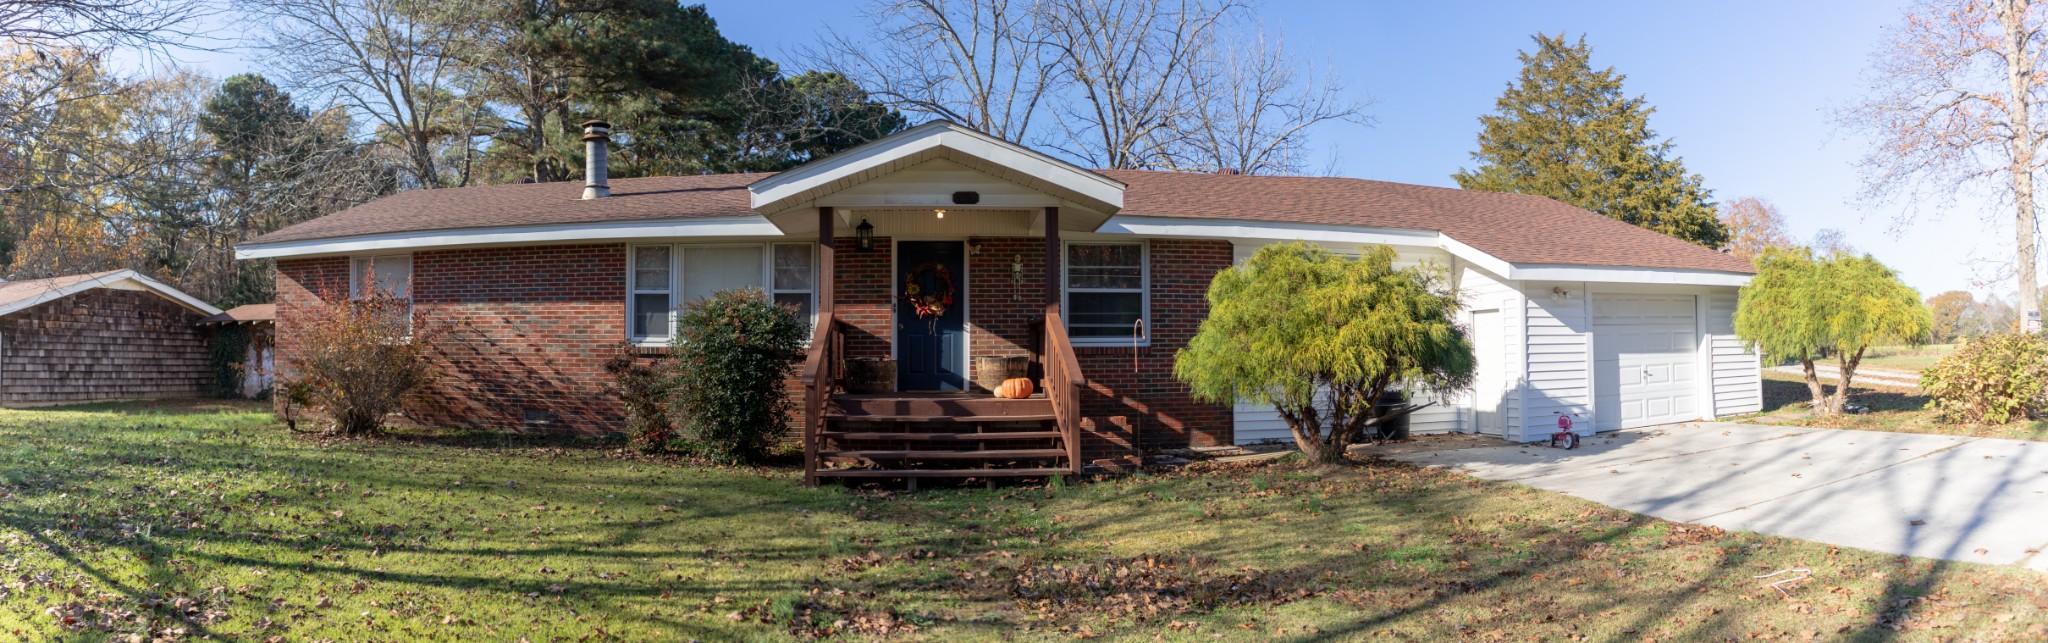 1719 E Grundy St E Property Photo - Tullahoma, TN real estate listing